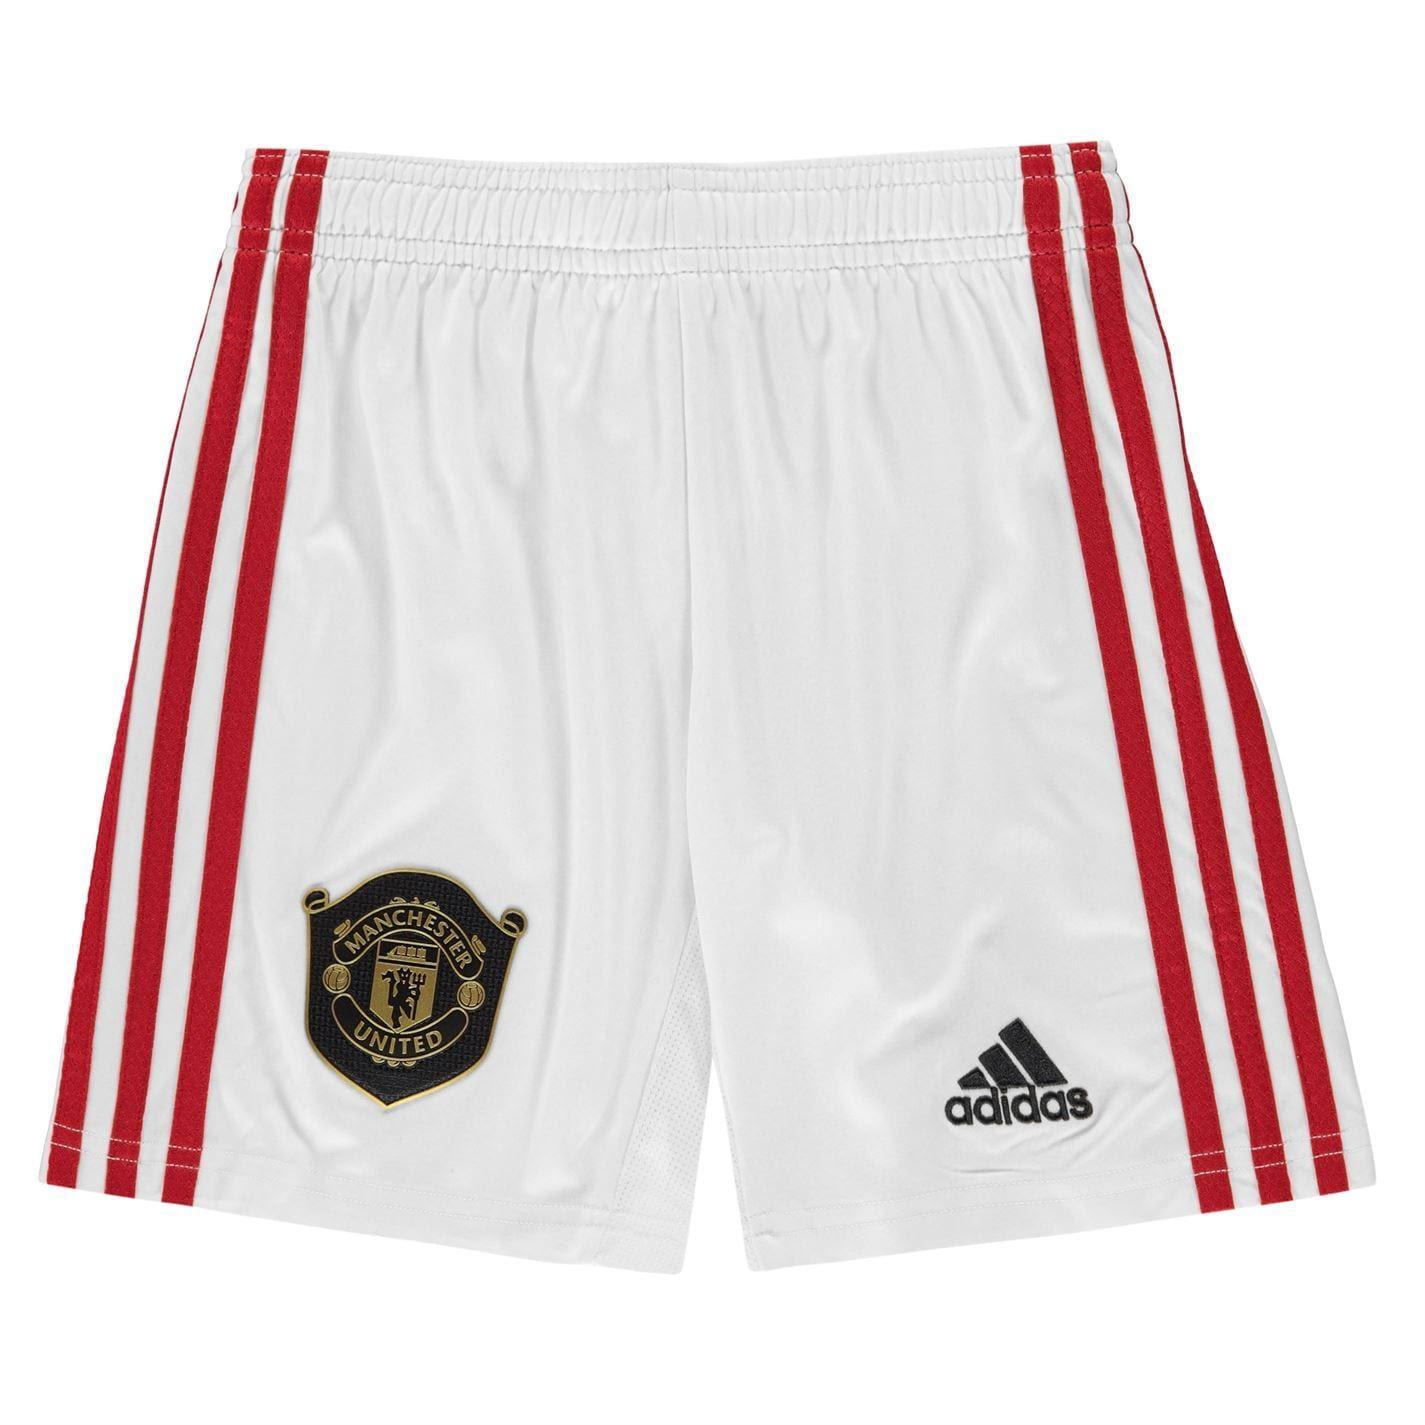 8 anni Pantaloncini Calcio Inghilterra